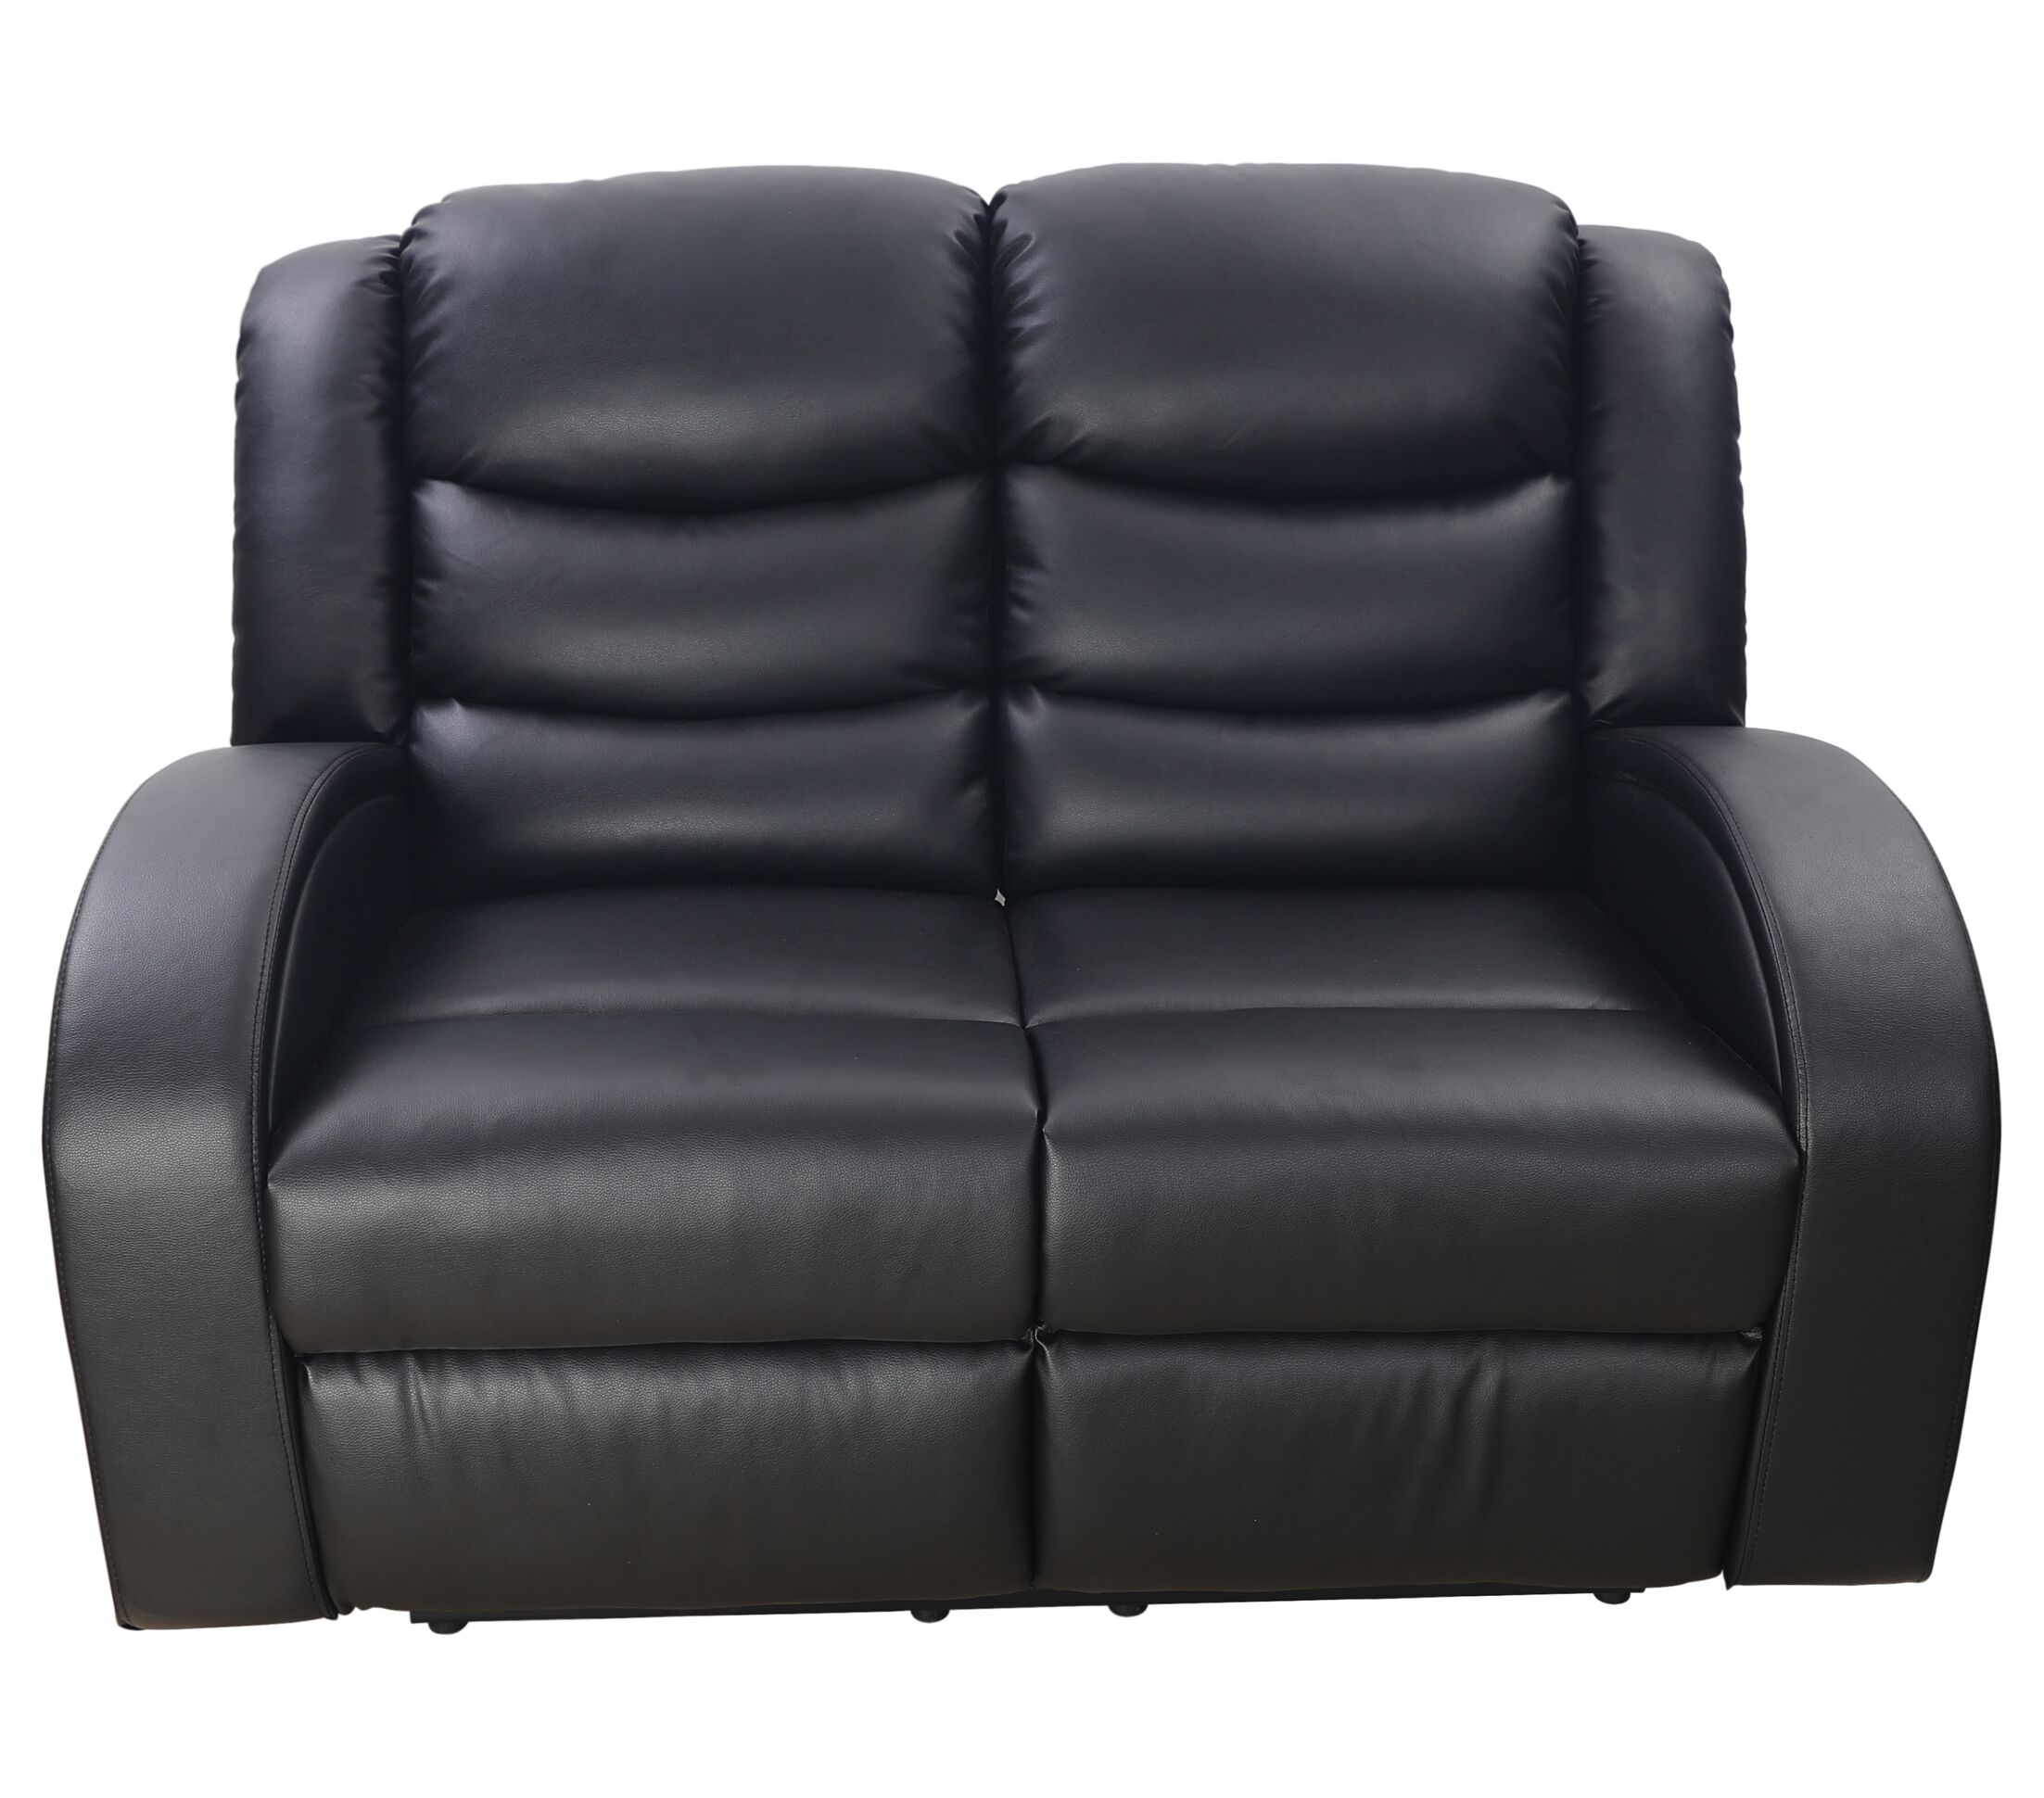 Mcpeak 3 Piece Living Room Set Upholstery Color: Black